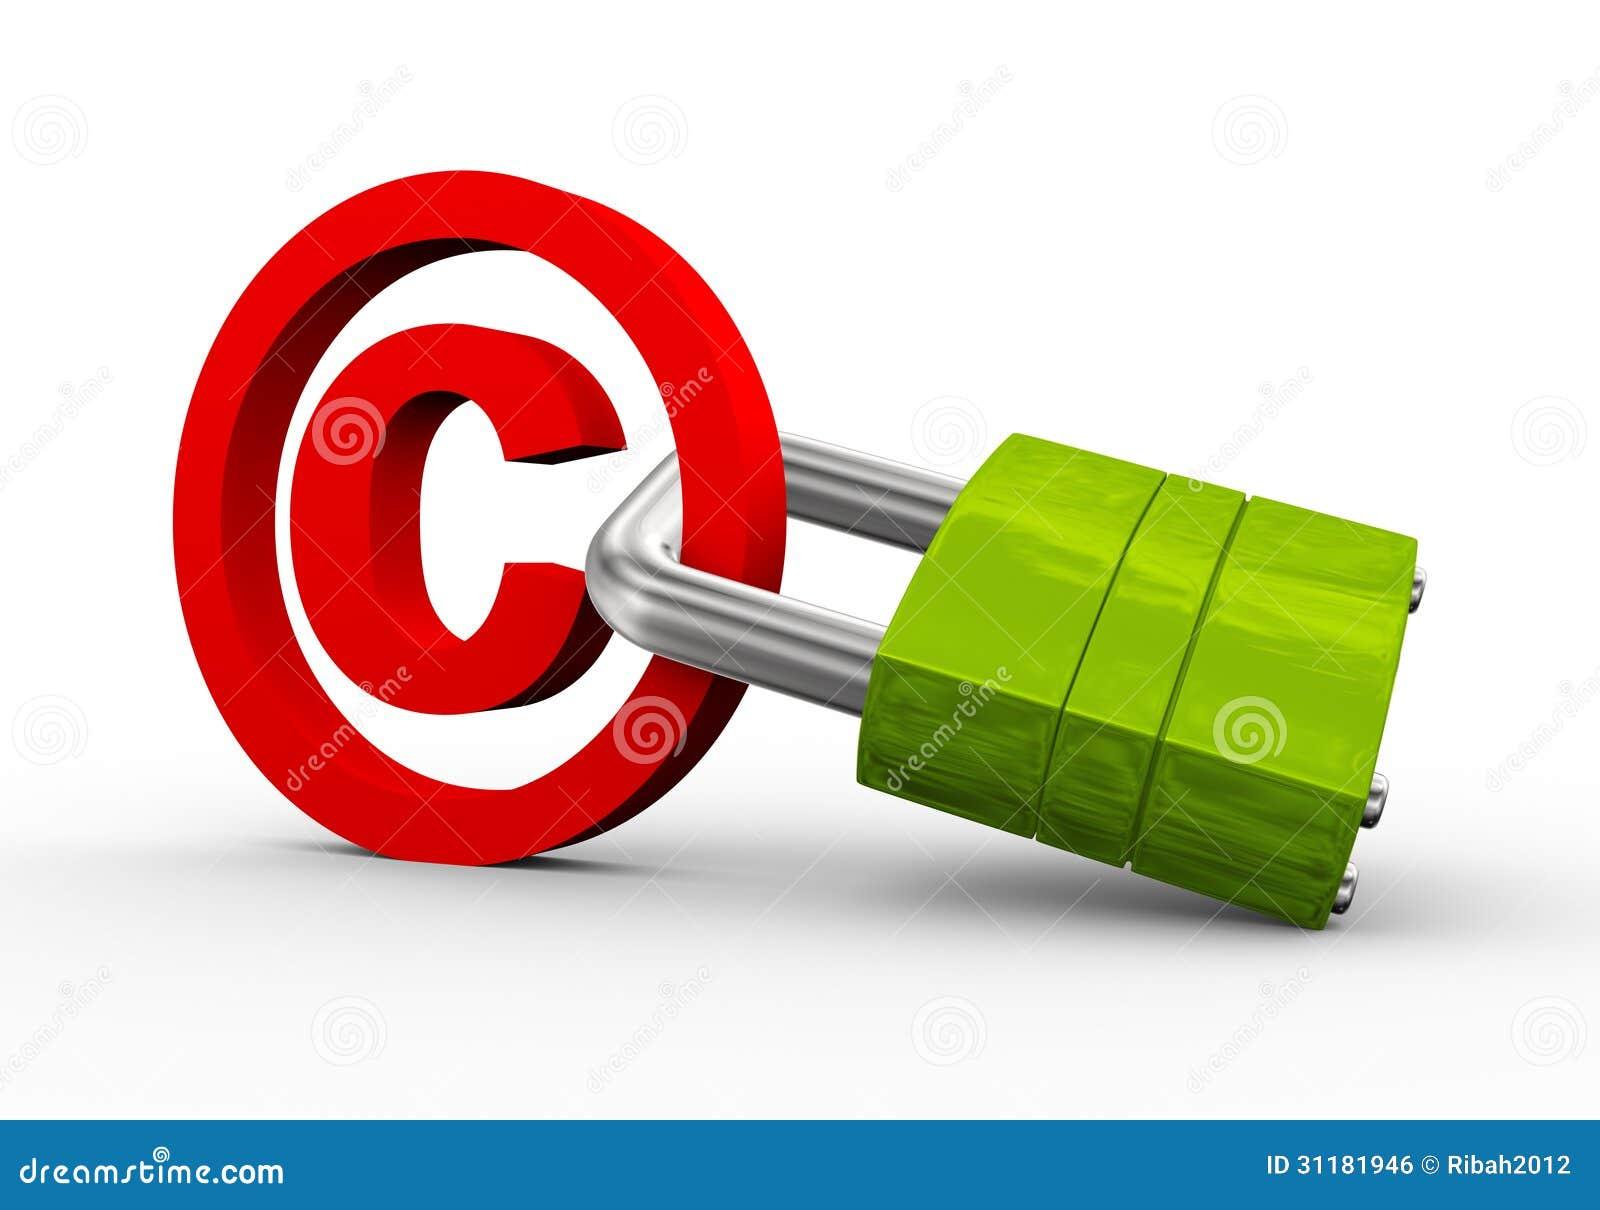 3d copyright symbol padlock stock illustration illustration of 3d copyright symbol padlock biocorpaavc